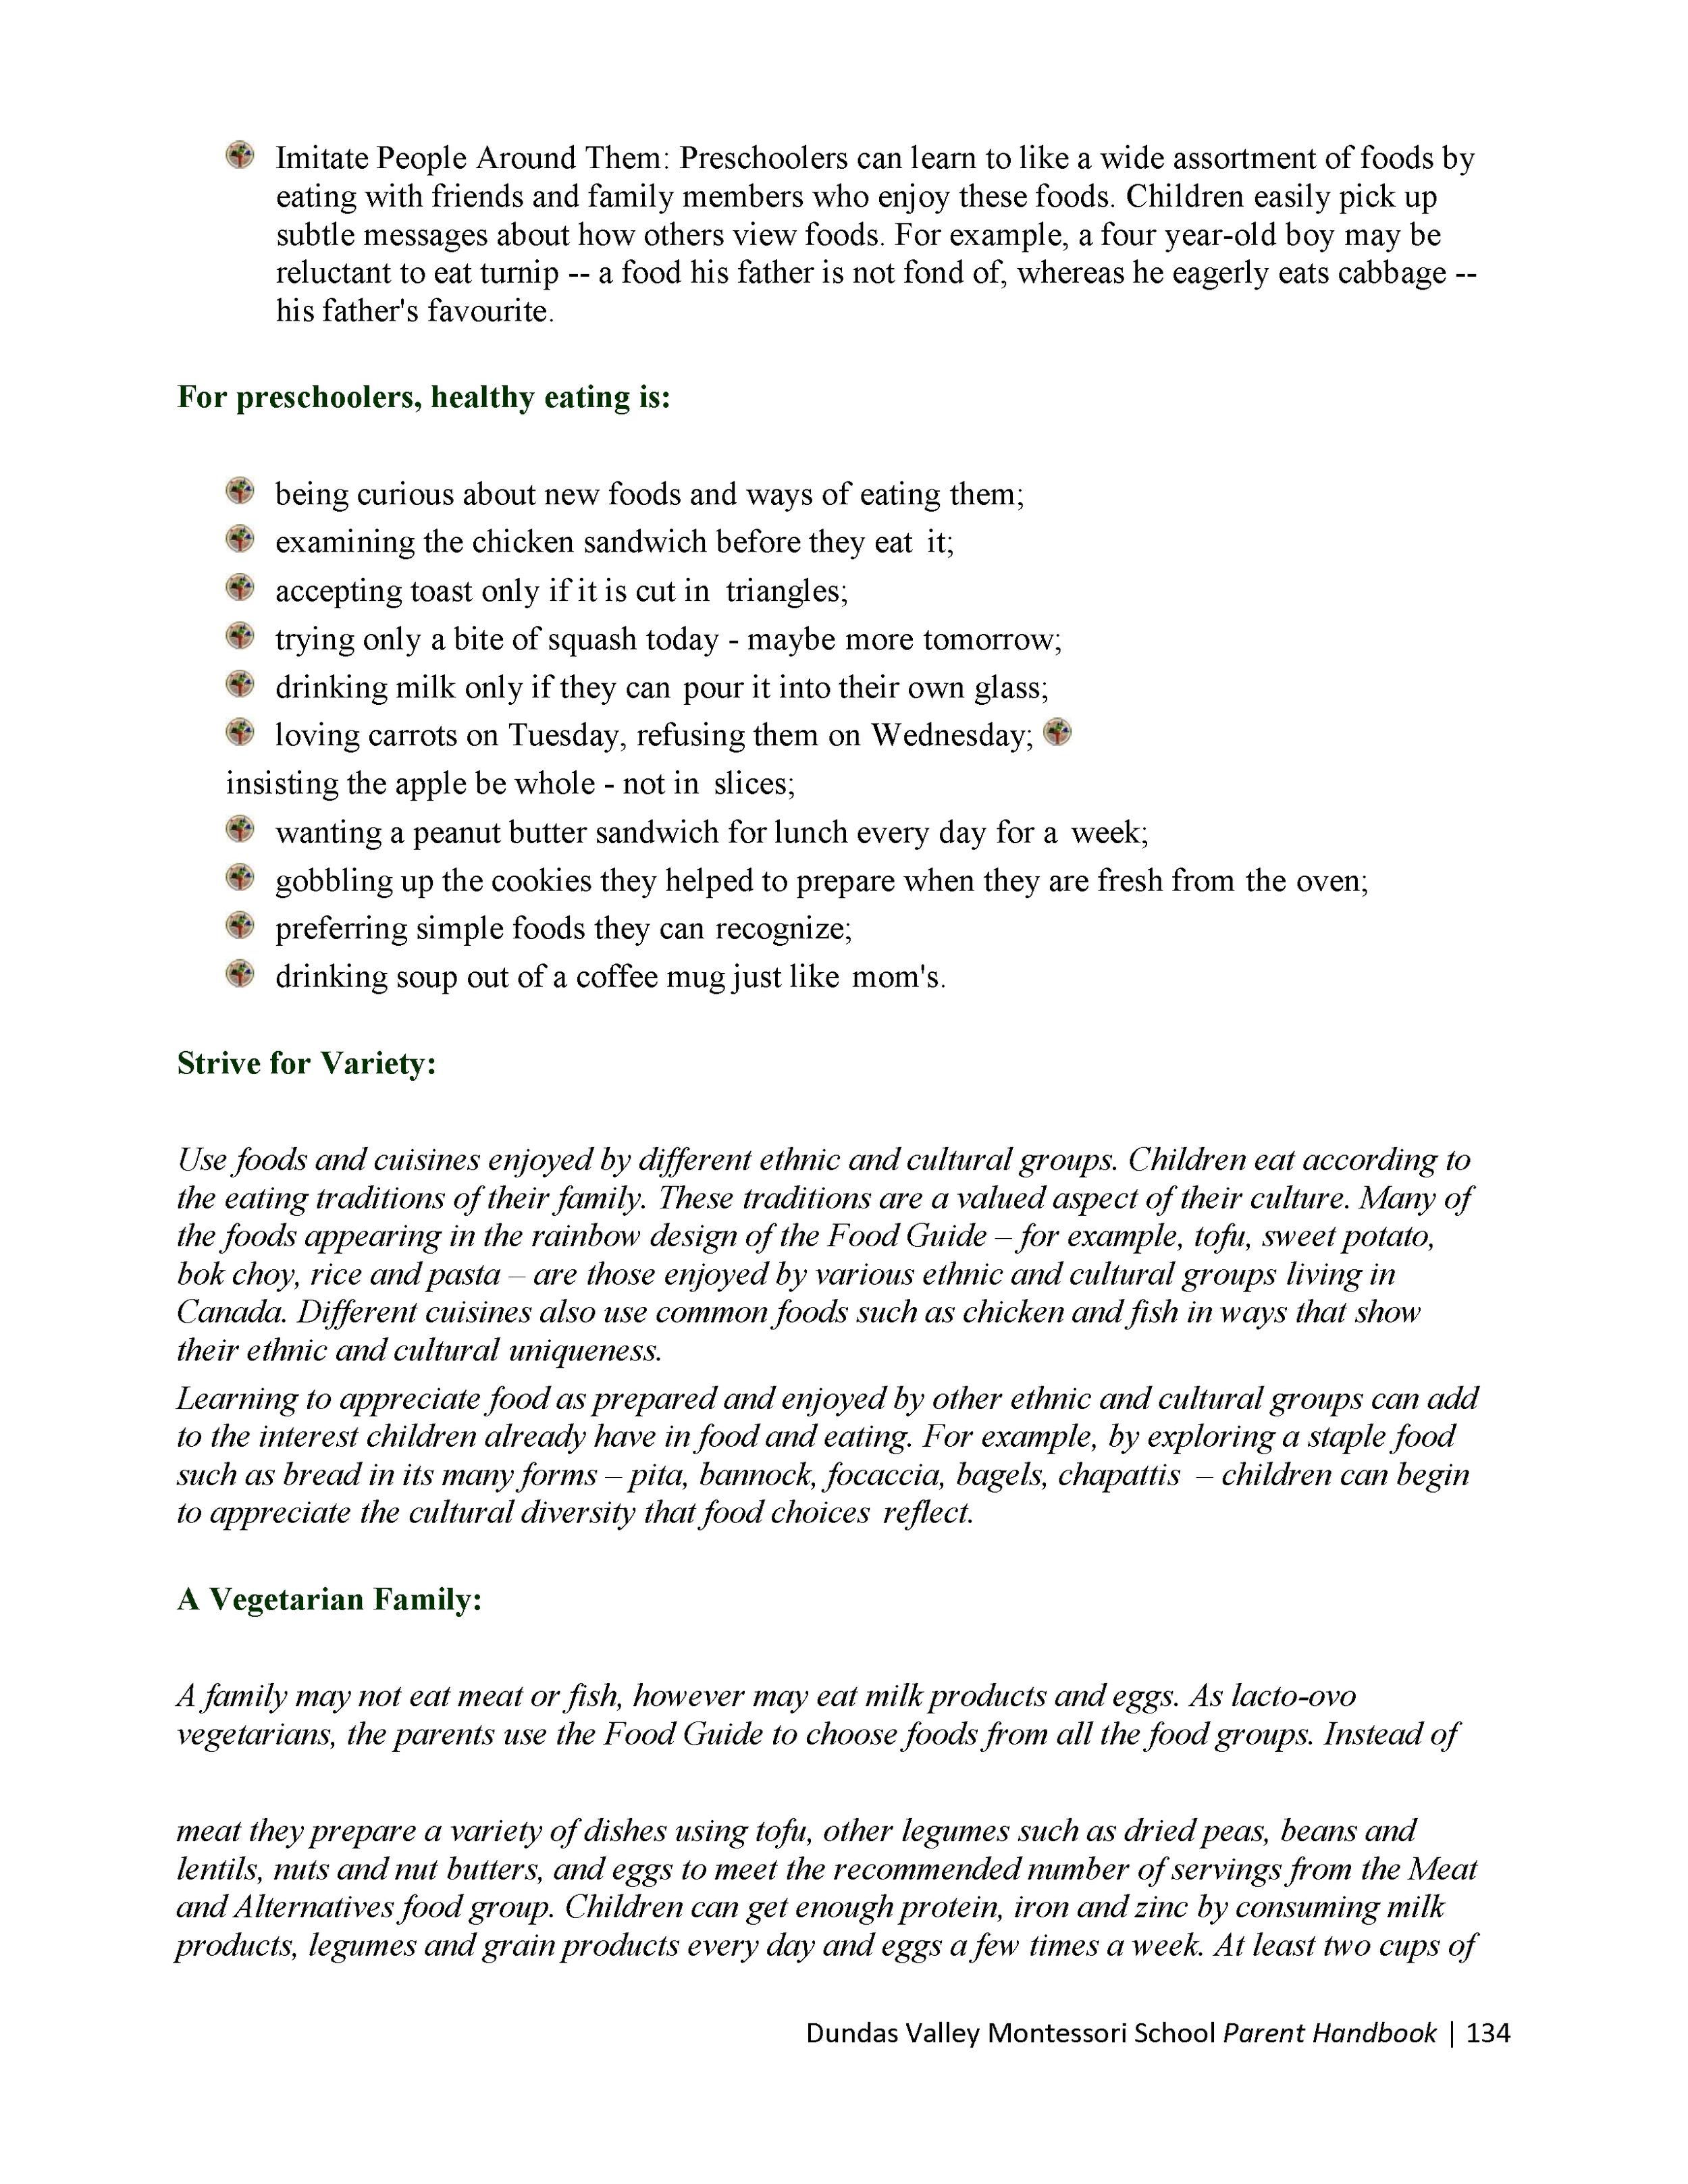 DVMS-Parent-Handbook-19-20_Page_136.png